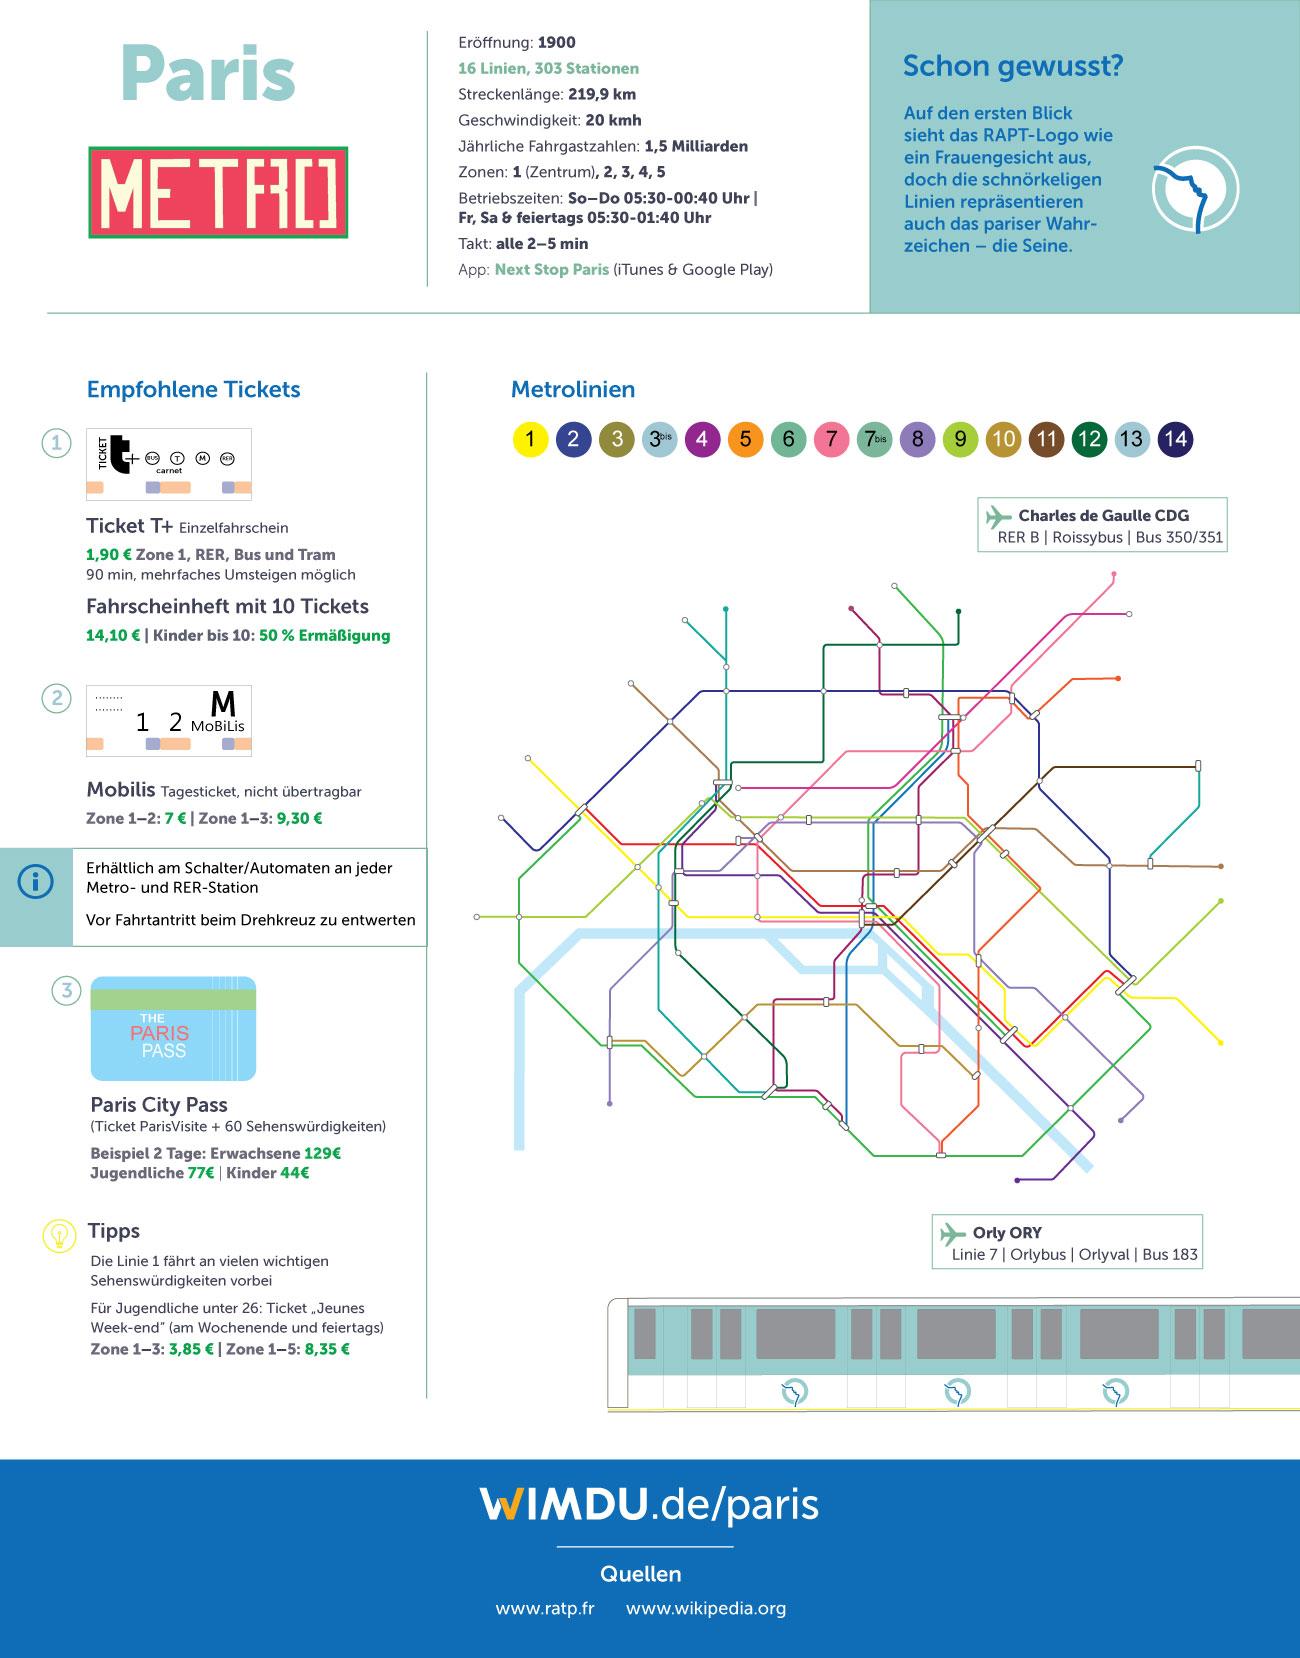 Paris Metro Zonen Karte.U Bahn Netze In Europaischen Metropolen Wimdu Blog